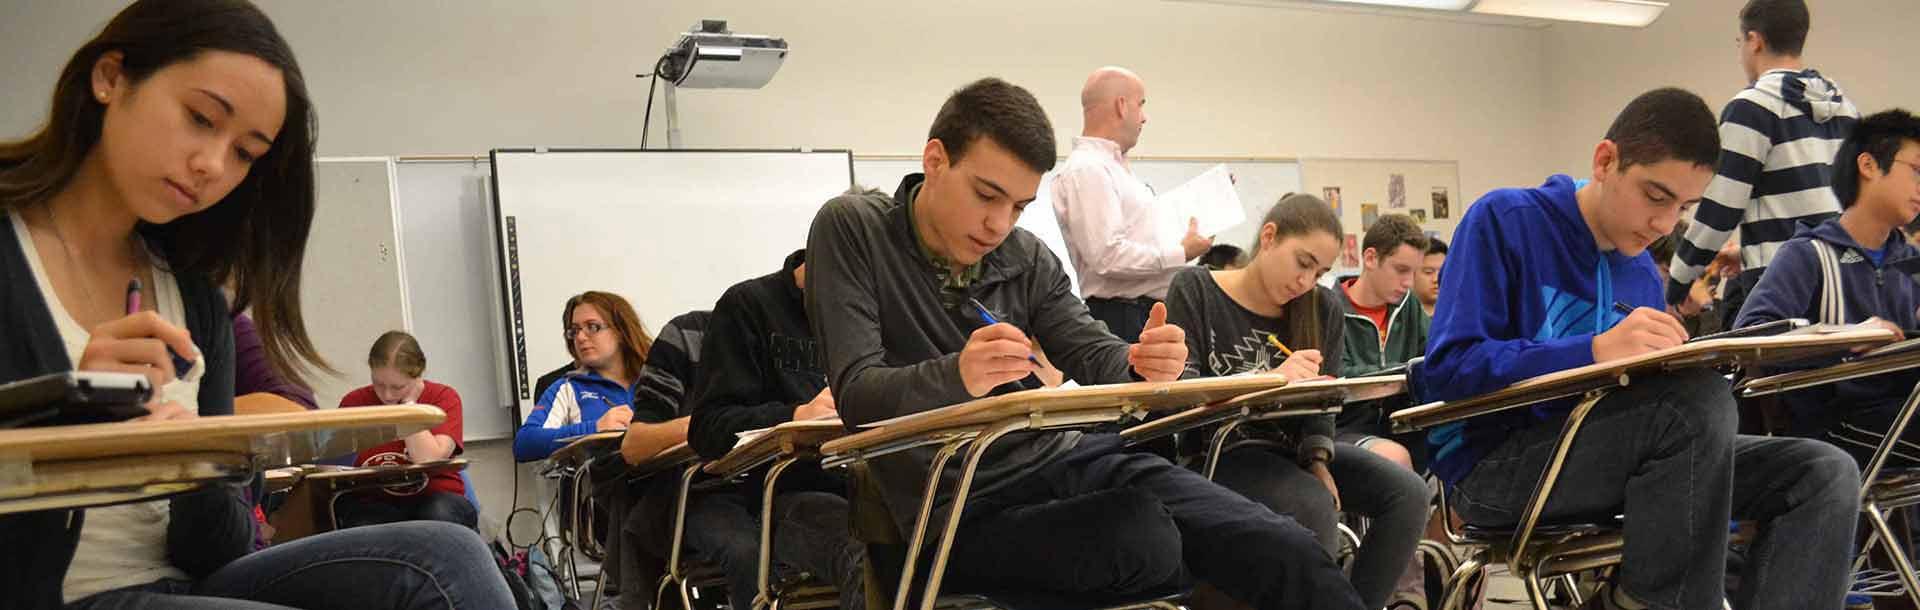 Educatius-NewtonSouthPublicSchools-MA-Class-Banner-2019